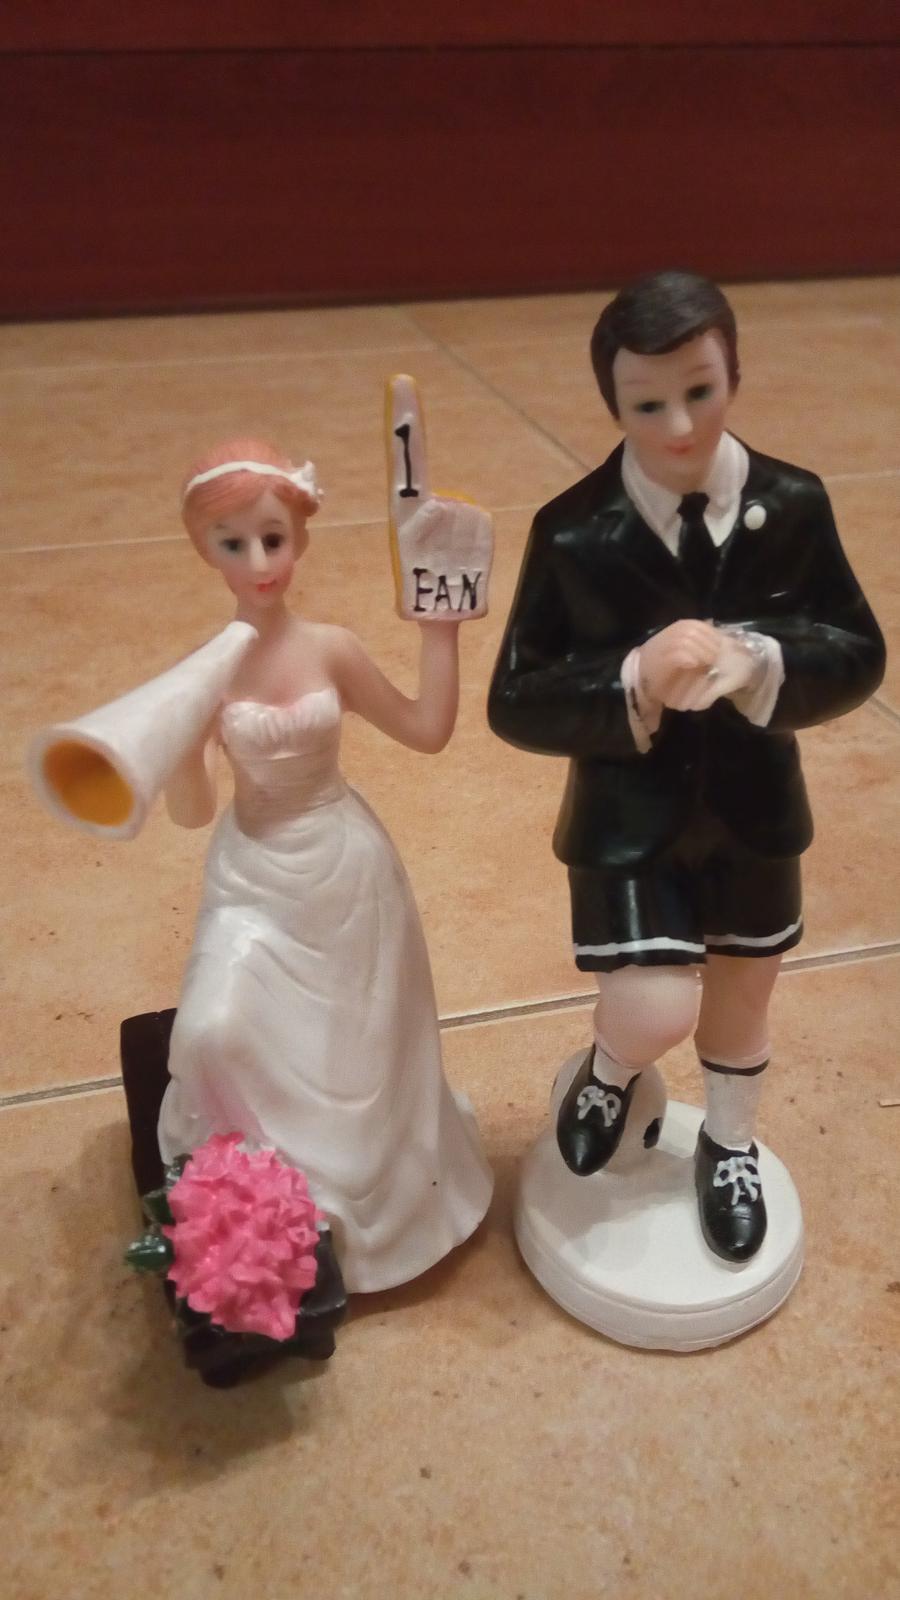 2ks figurky na tortu pre futbalistu - rozhodcu - Obrázok č. 3